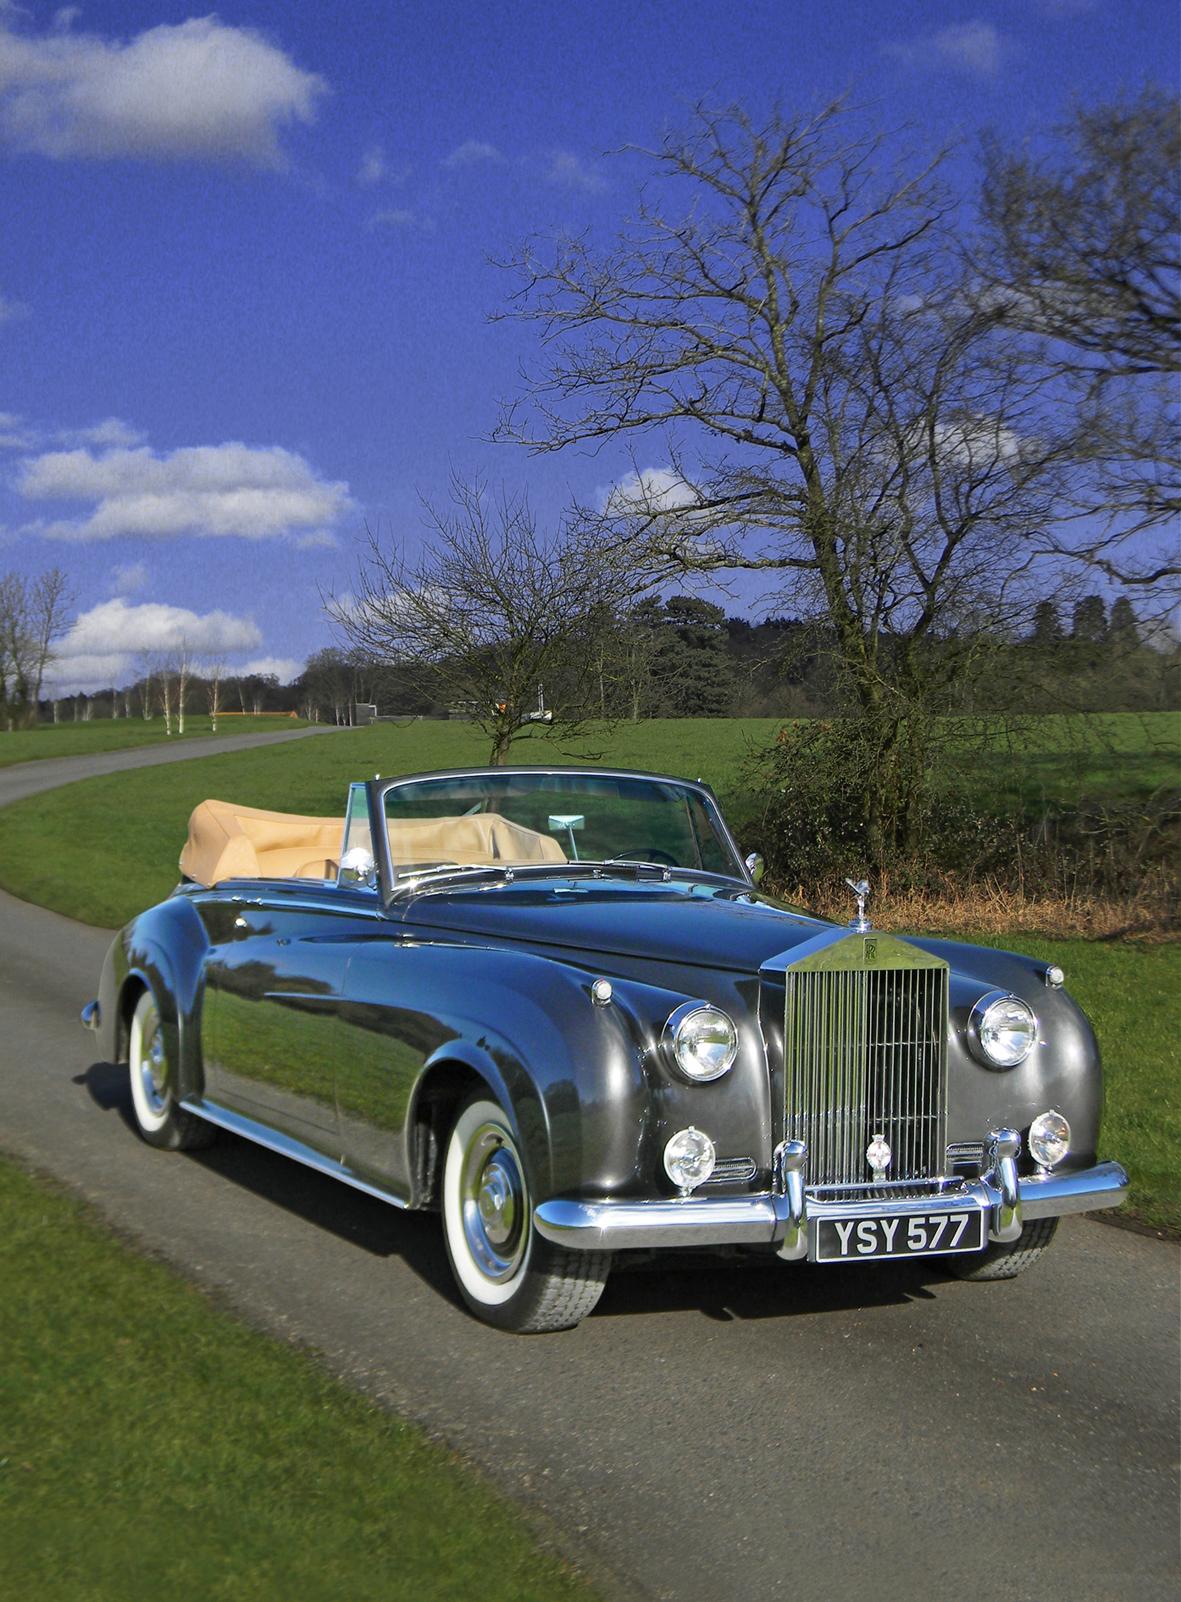 1962 rolls royce silver cloud ii drophead coupe for sale classic car magazine classic car. Black Bedroom Furniture Sets. Home Design Ideas